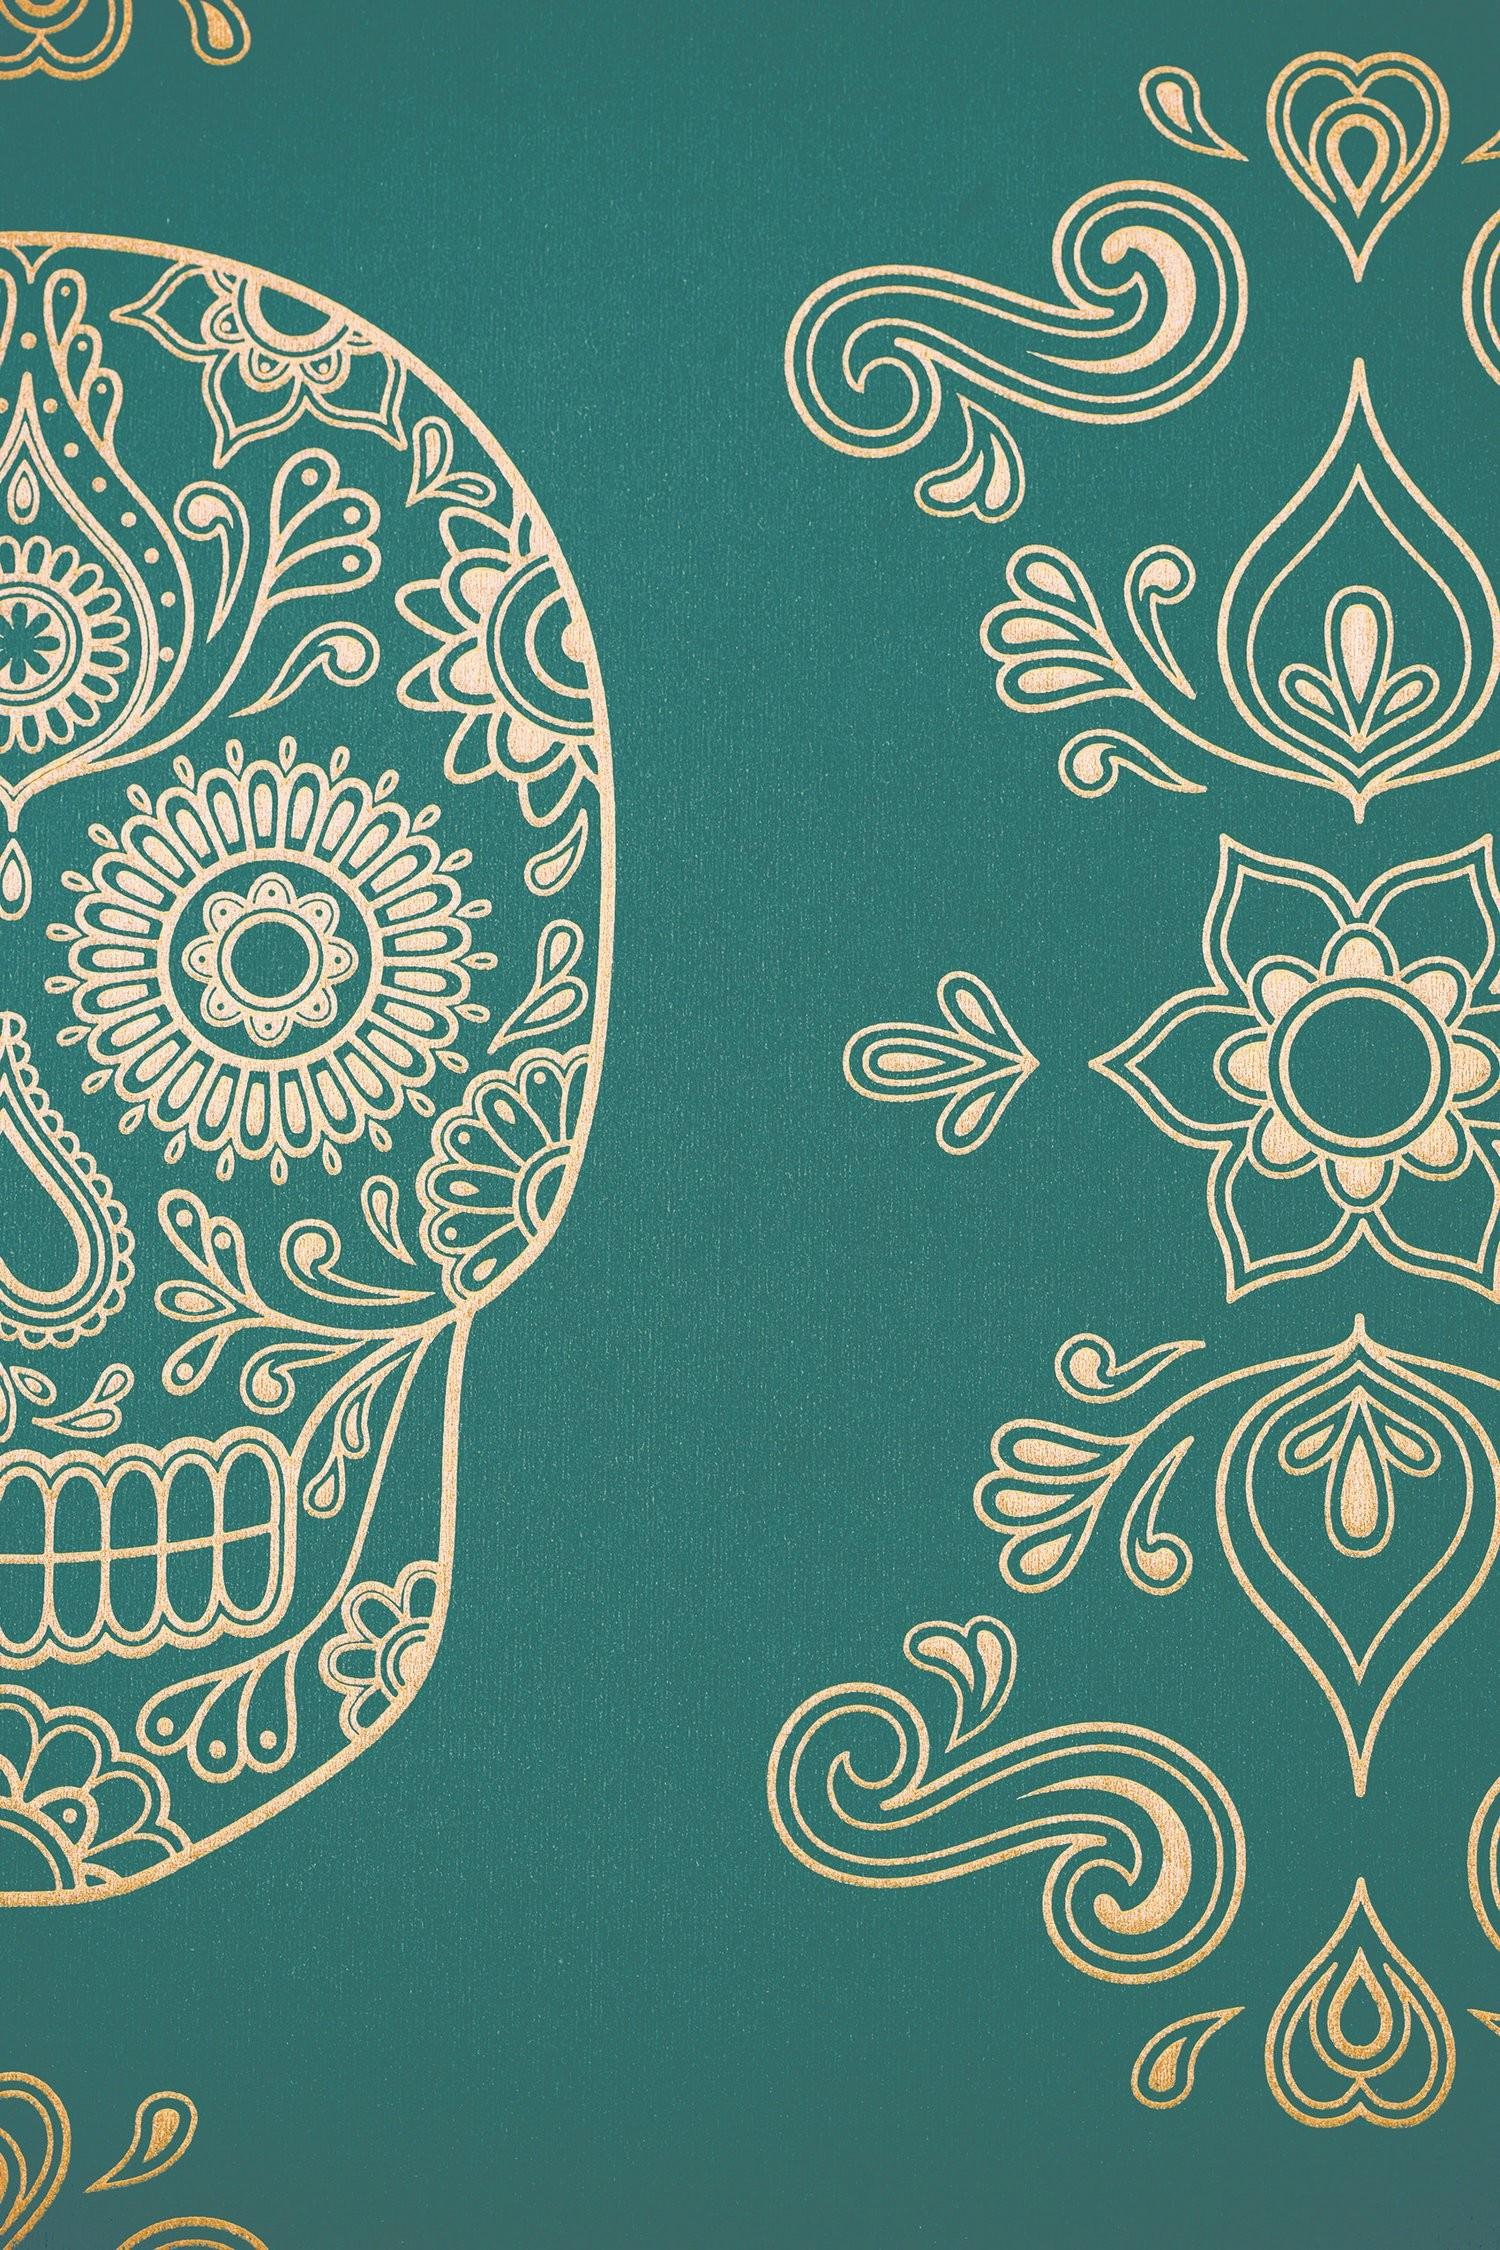 1500x2250 Image of Day of the Dead Sugar Skull Wallpaper - Emerald .